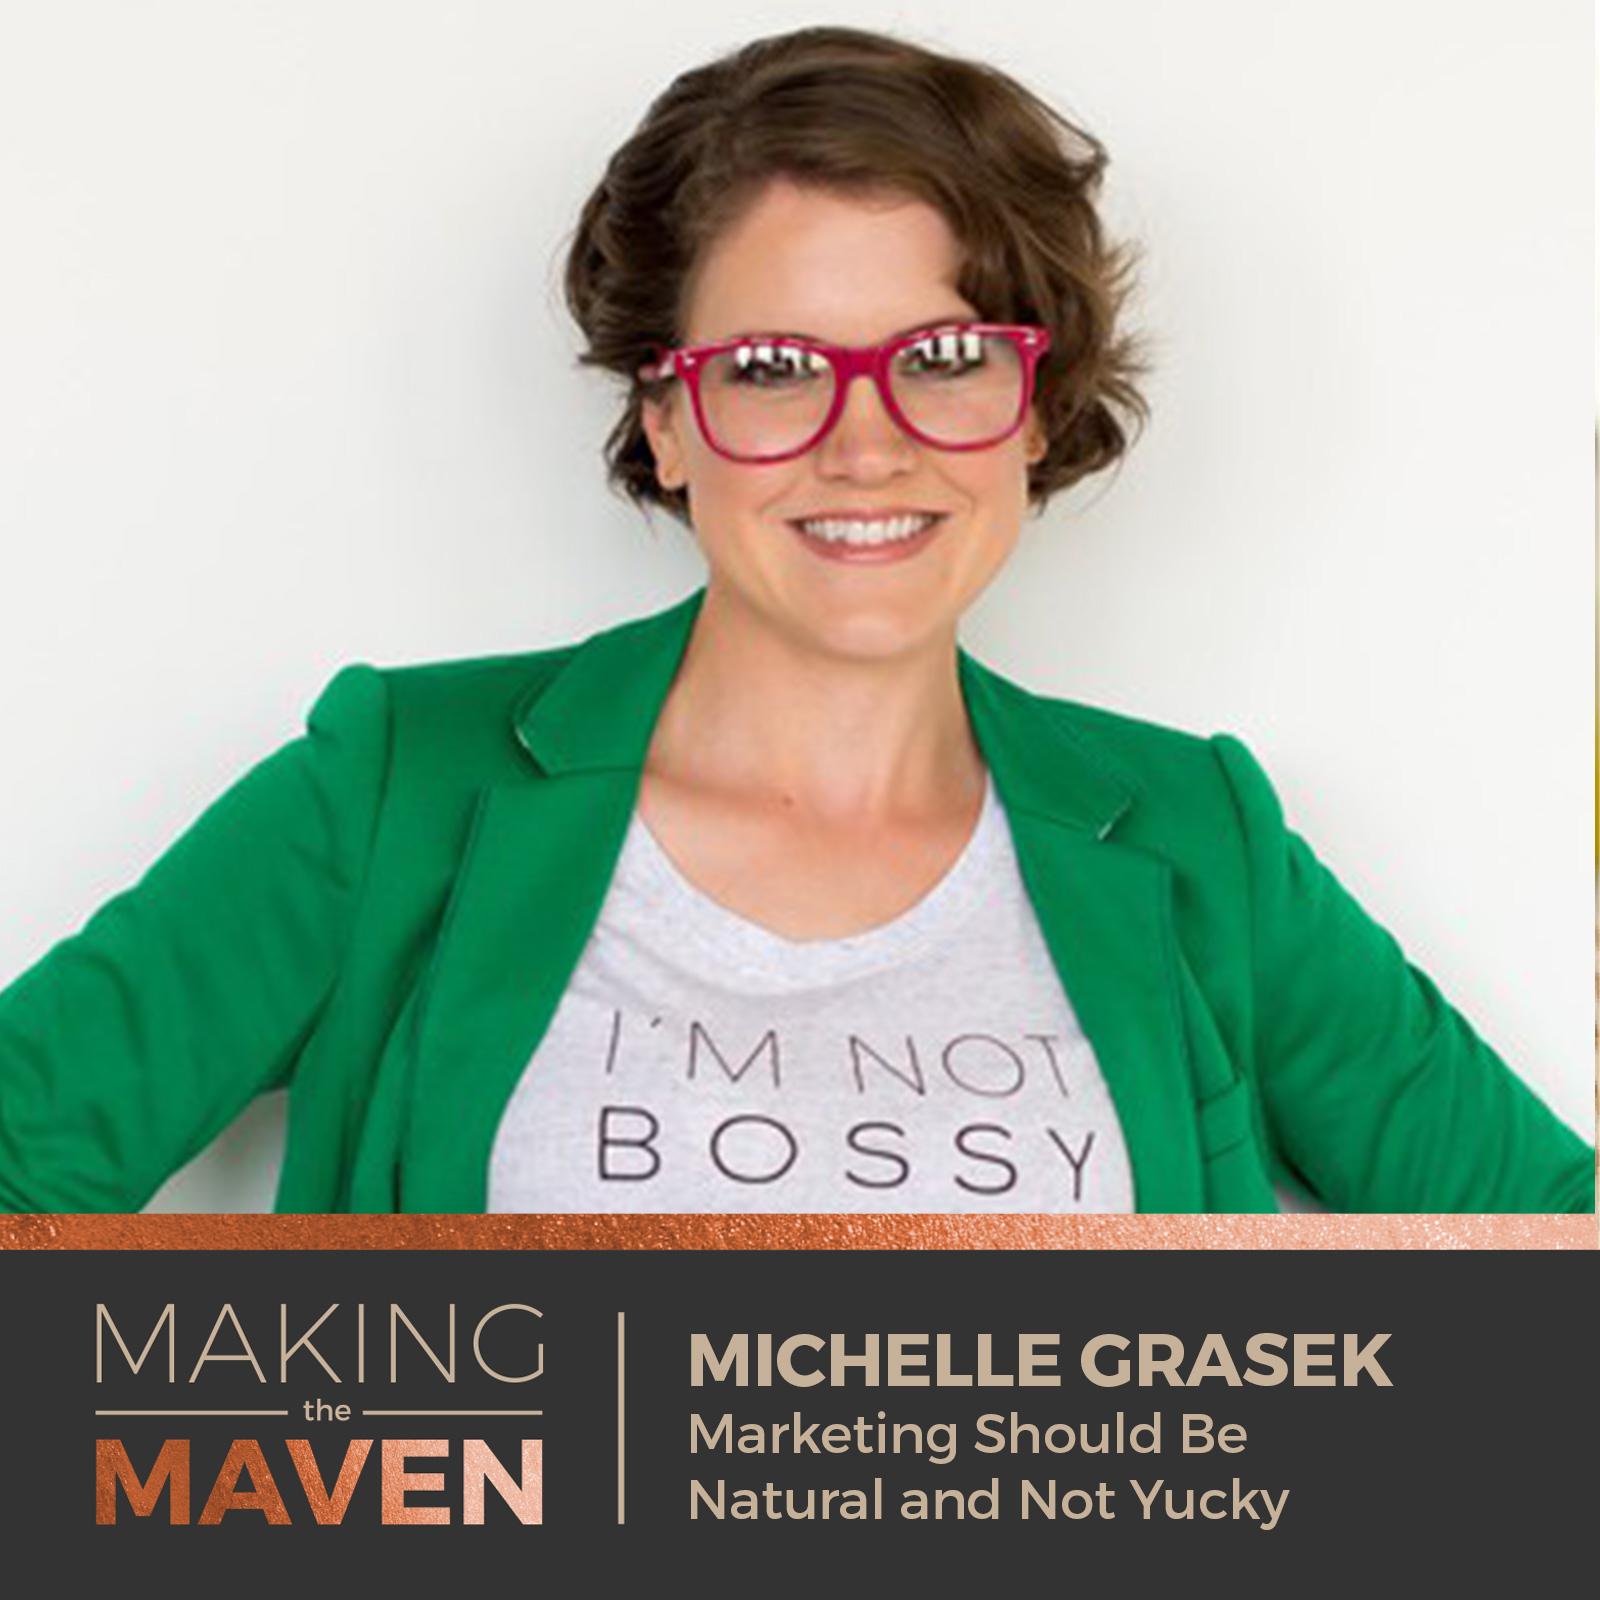 Michelle Grasek